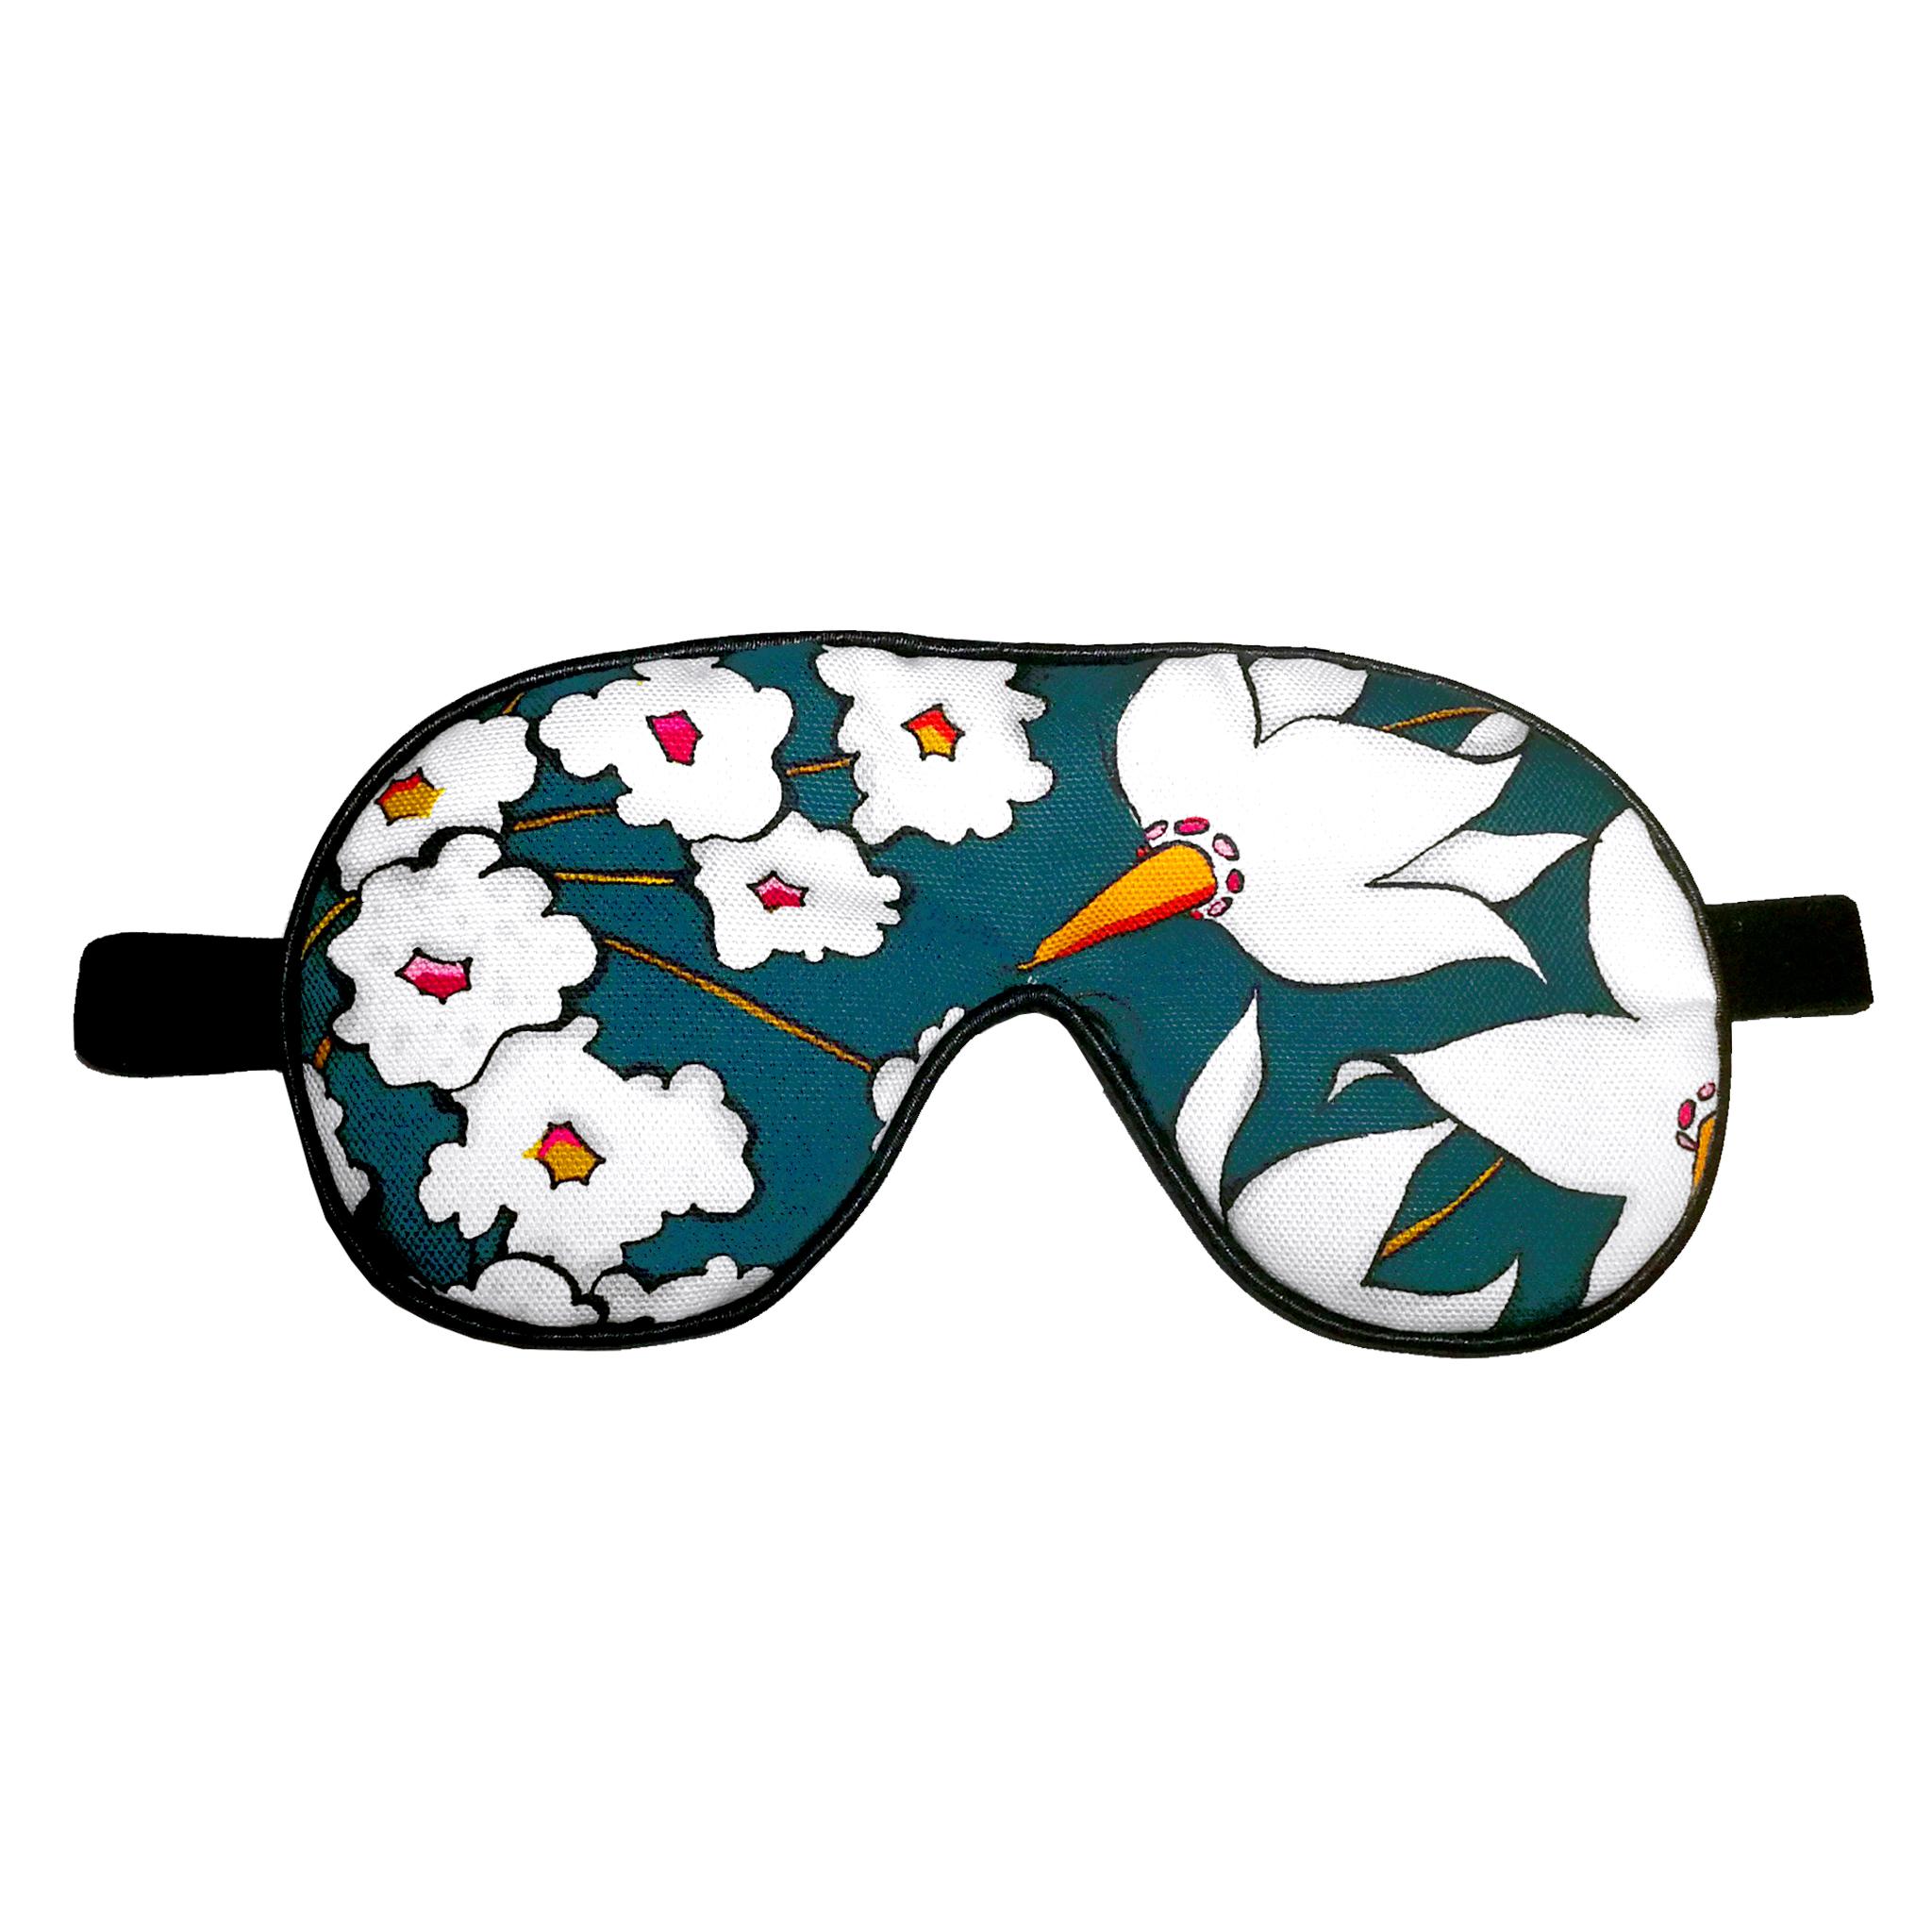 Floral Print Eye Mask 'Deadly Bloom' teal